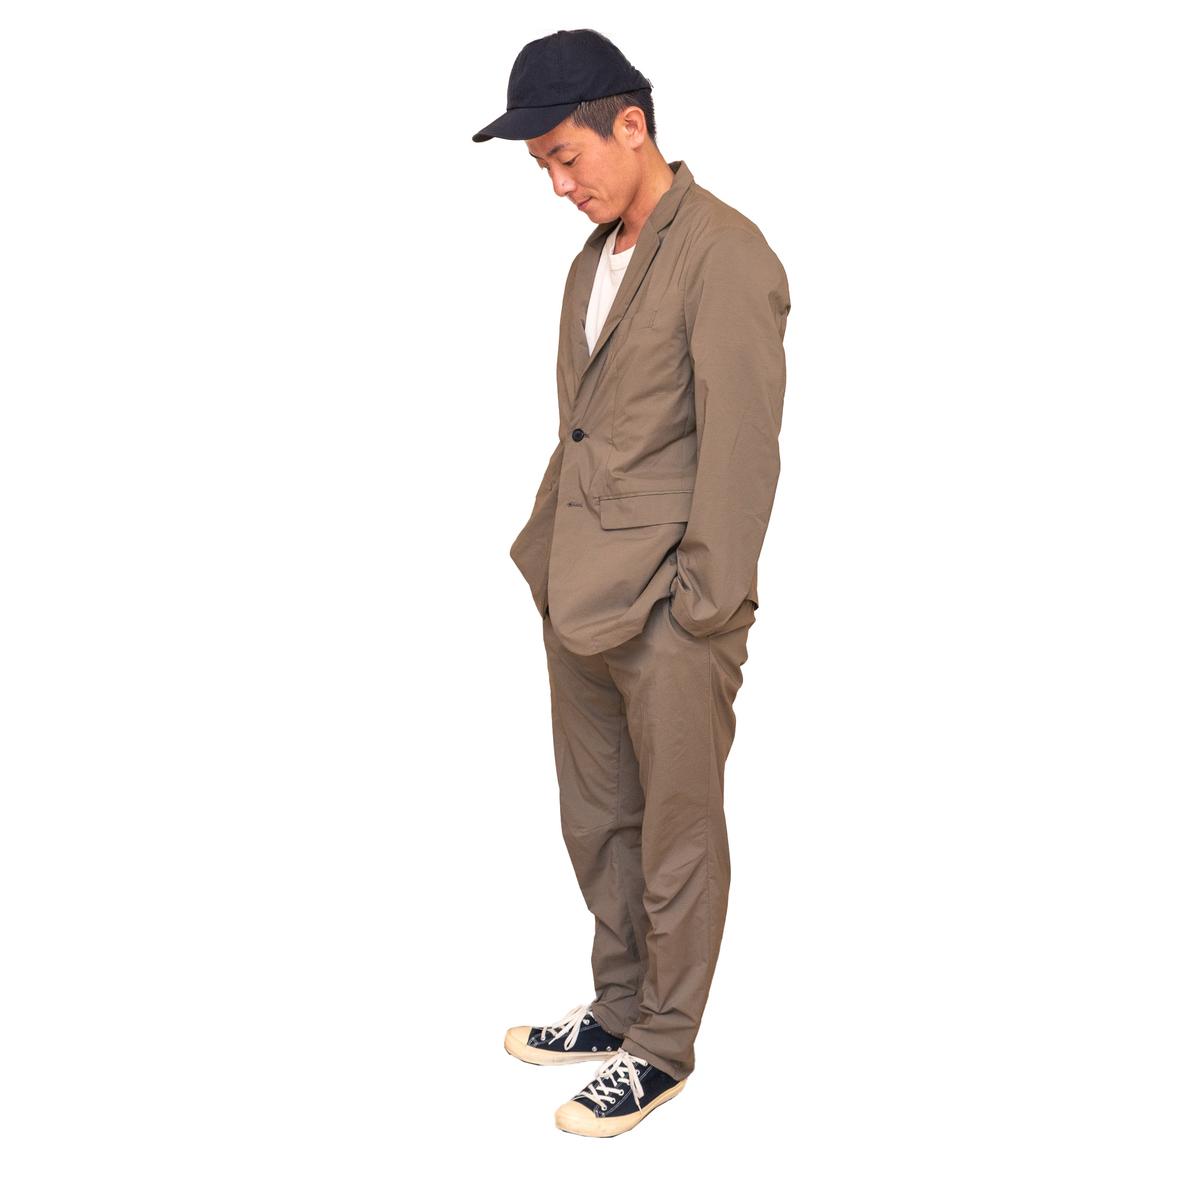 f:id:yamada0221:20210729092618j:plain